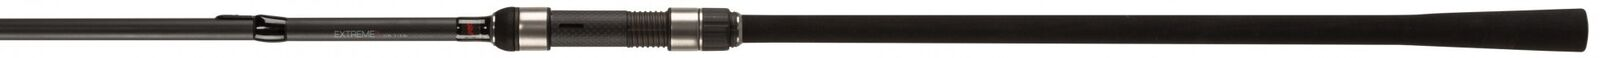 Karpfen-Rute JRC Extreme TX 50 12ft 3,6m 3lb Angelrute Grundrute Köderfischrute